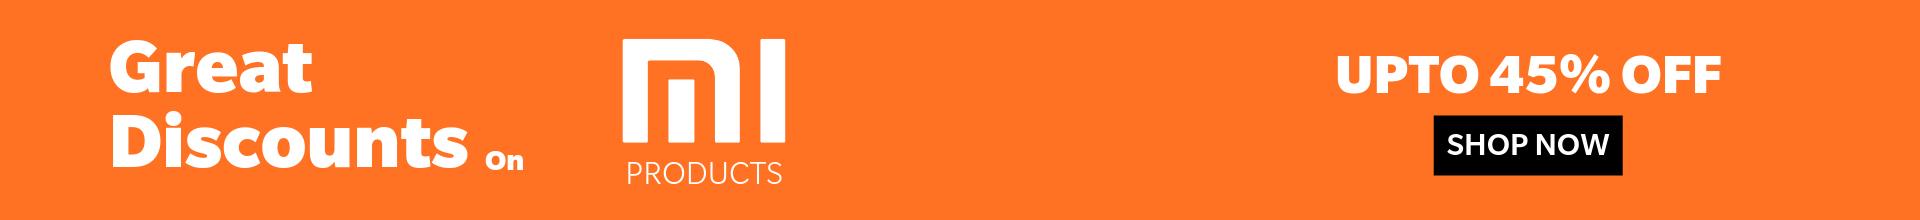 Xiaomi Discount Web Banner 1920×220